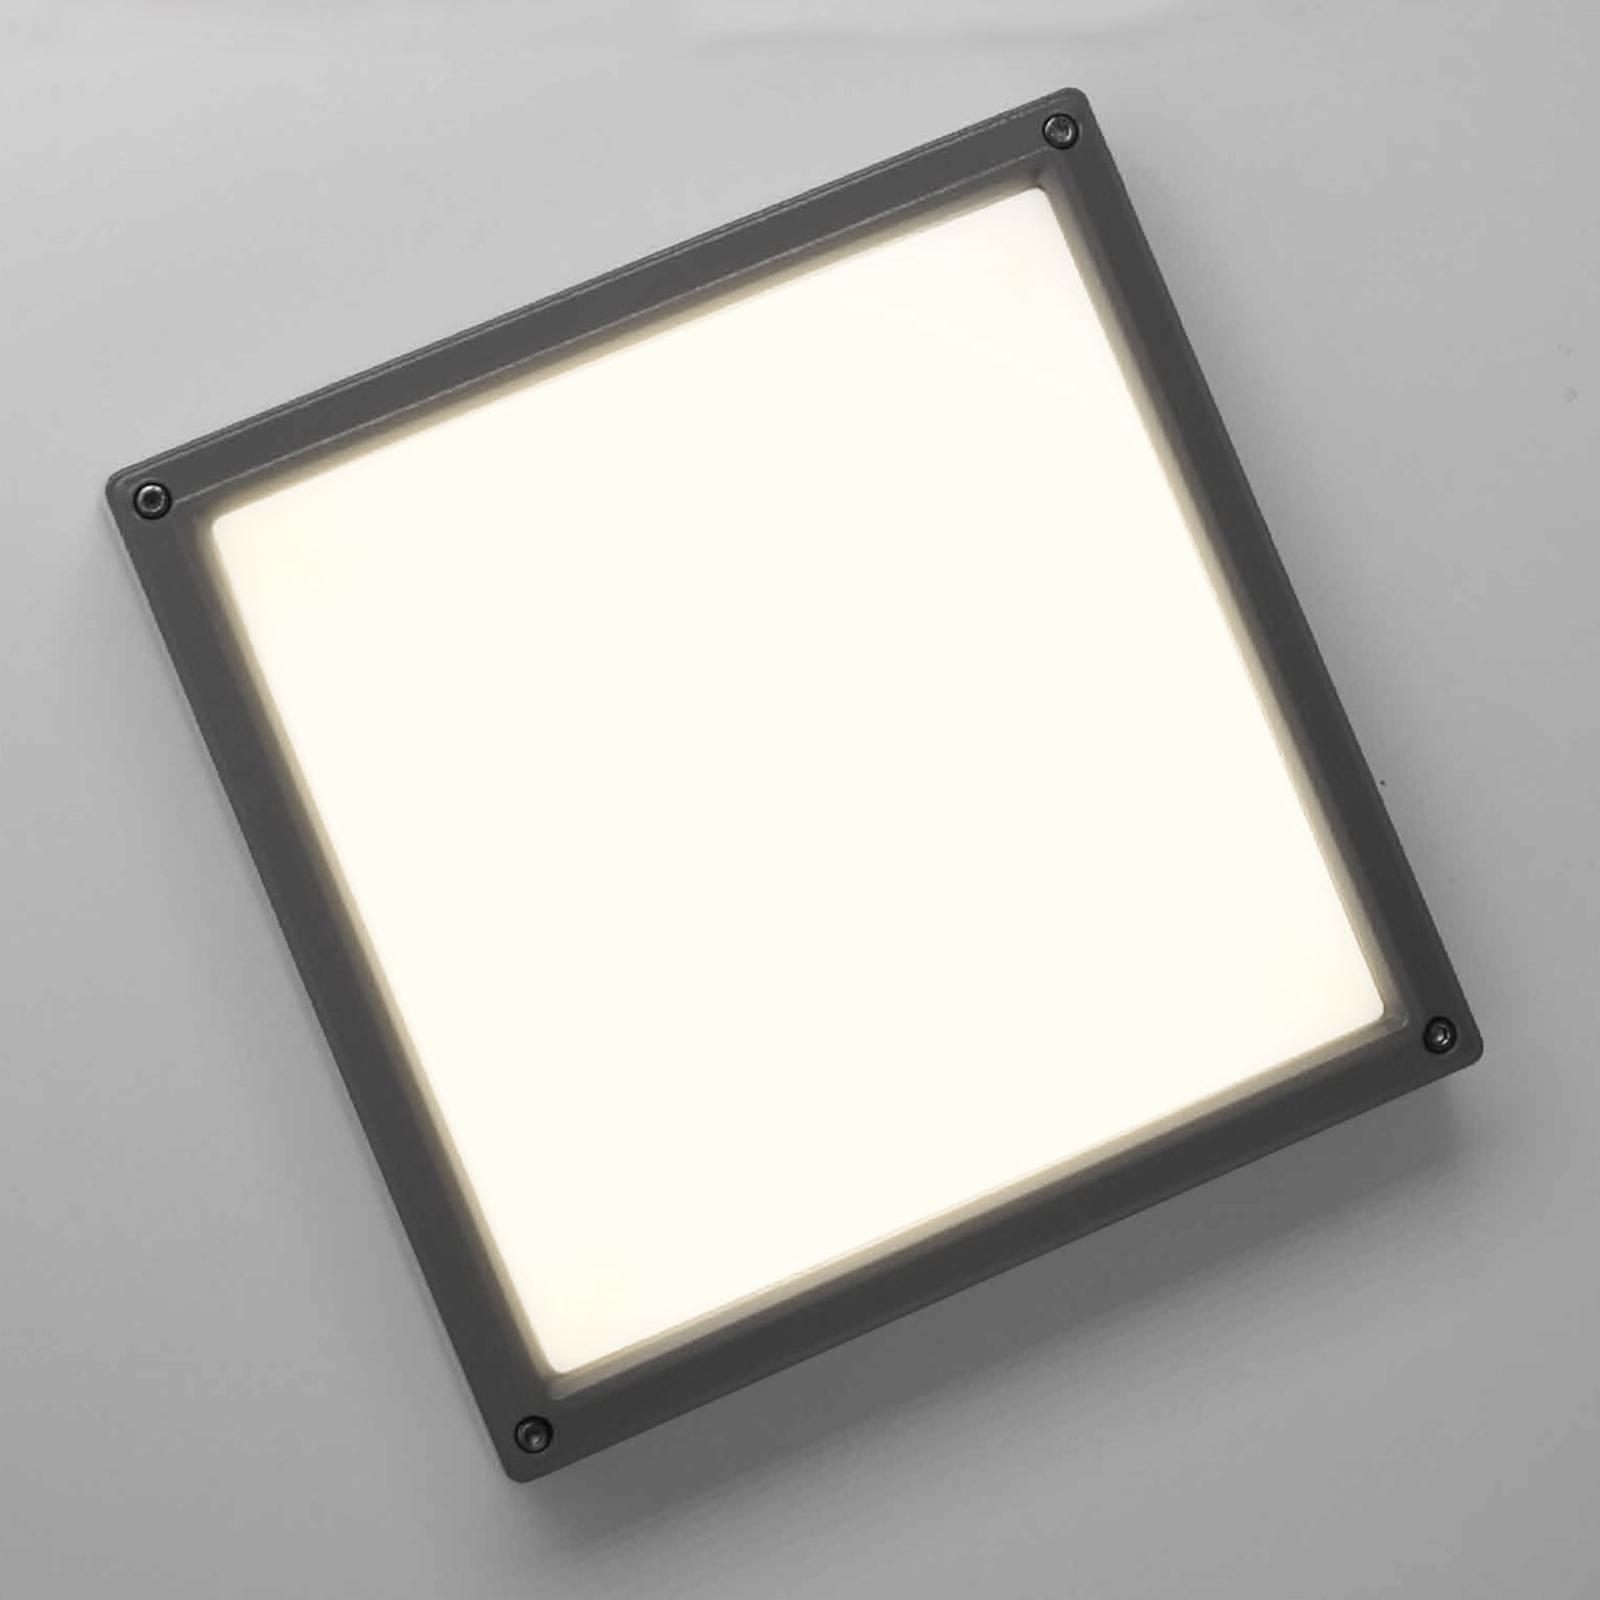 SUN 11 - LED vägglampa 13W, antracit 3K